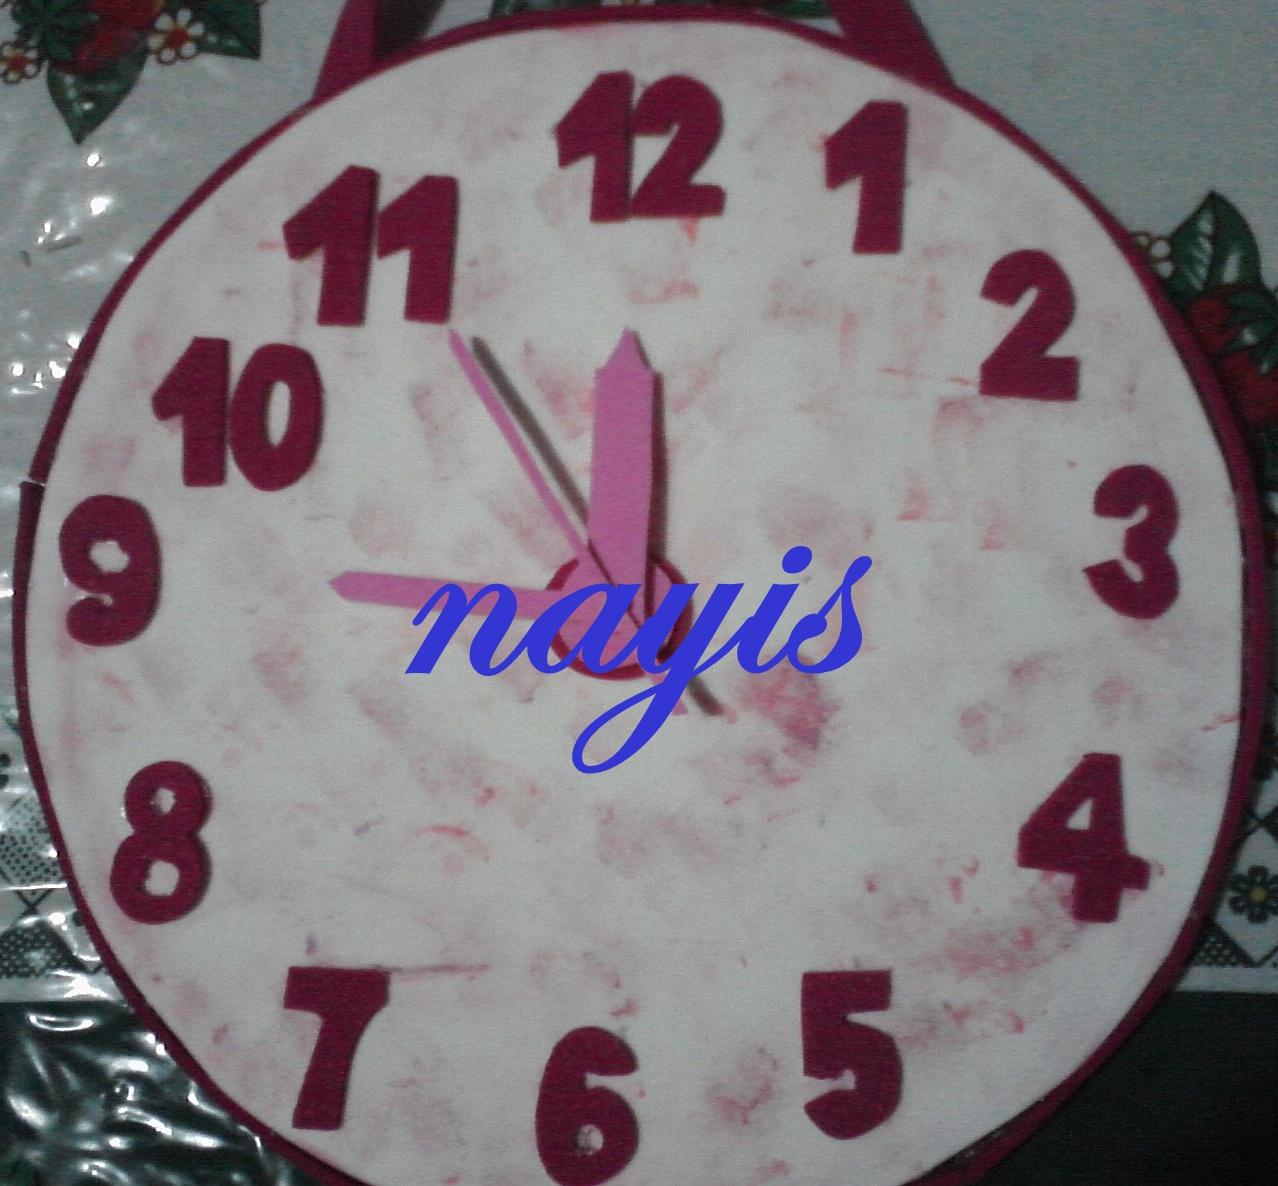 Kositas Nayis's: Reloj en foami